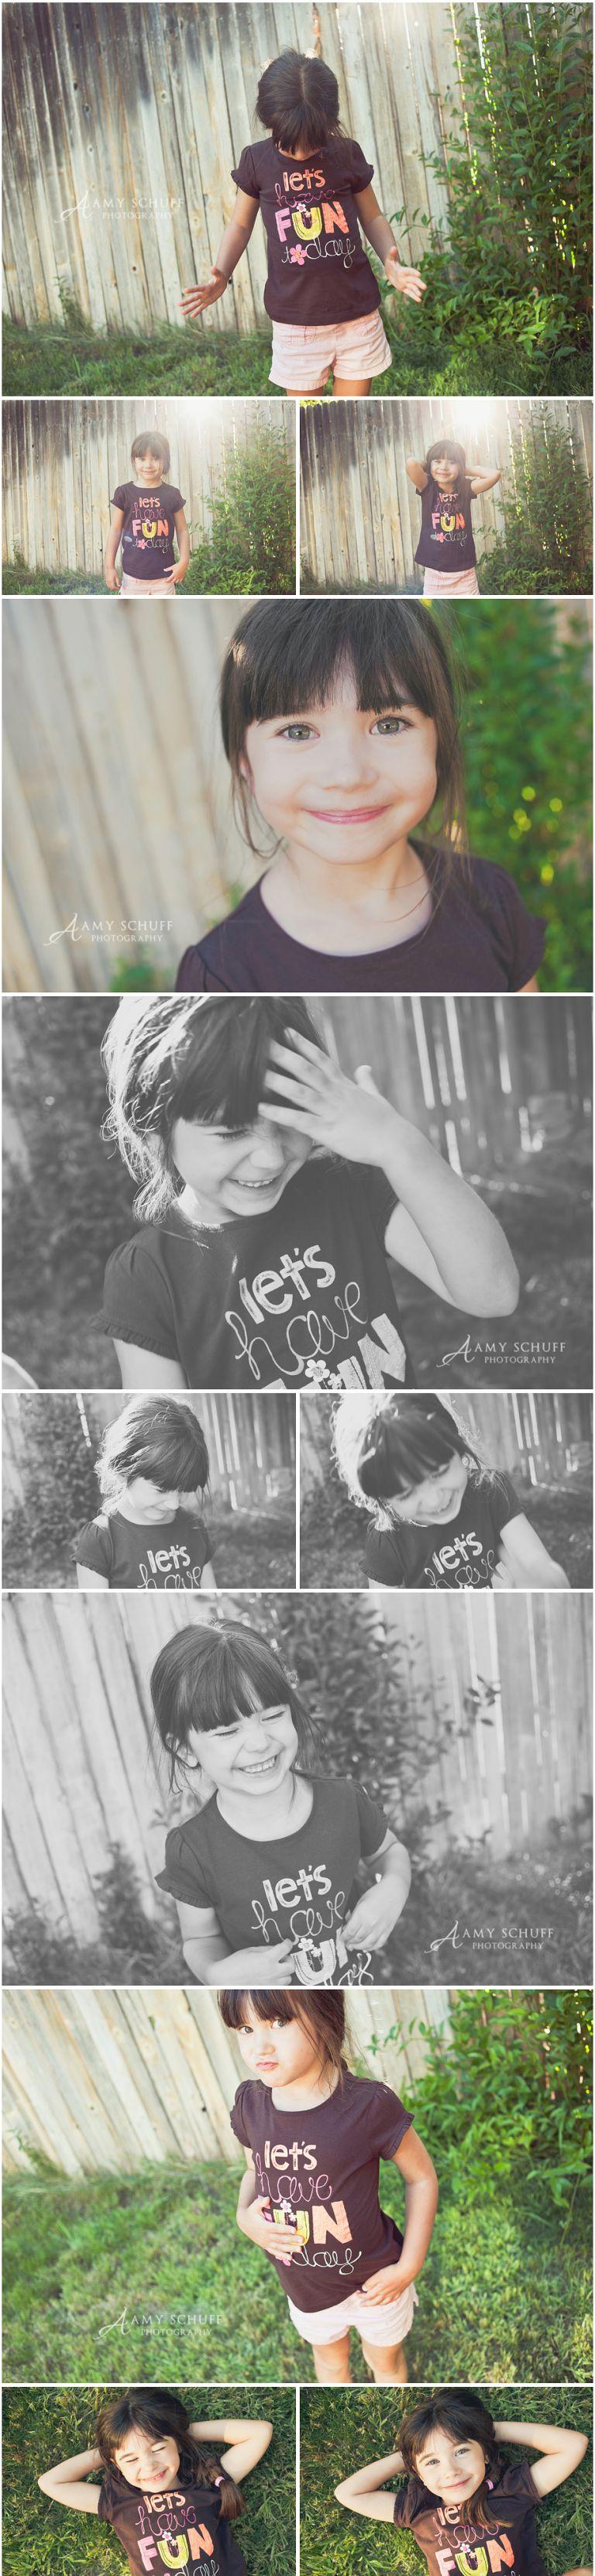 Amy Schuff - Sacramento Kids Photography